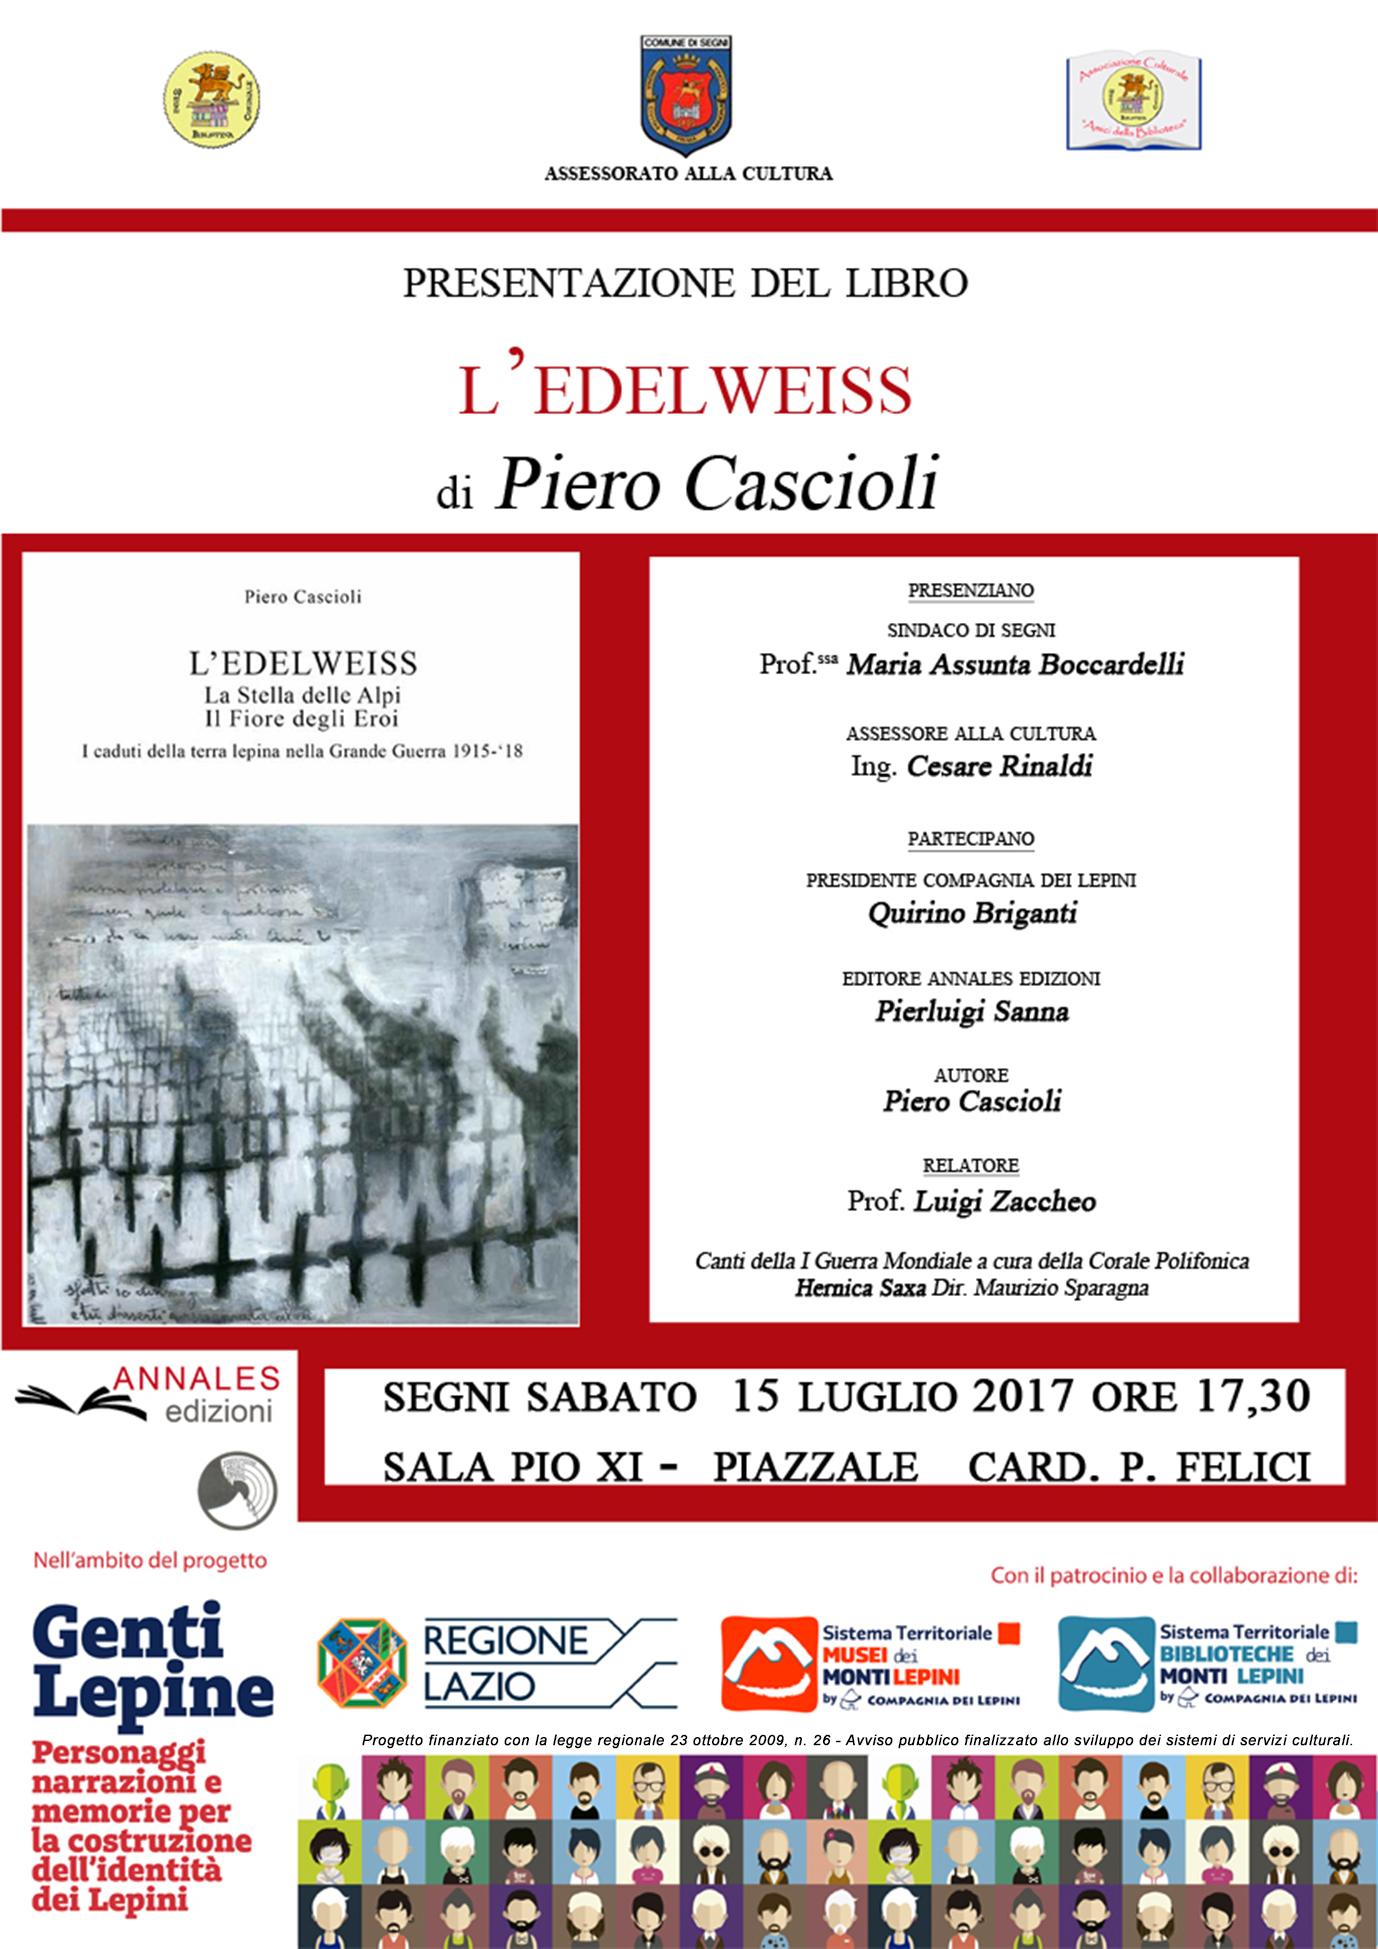 15-07-presentazione-ledelweiss-segni